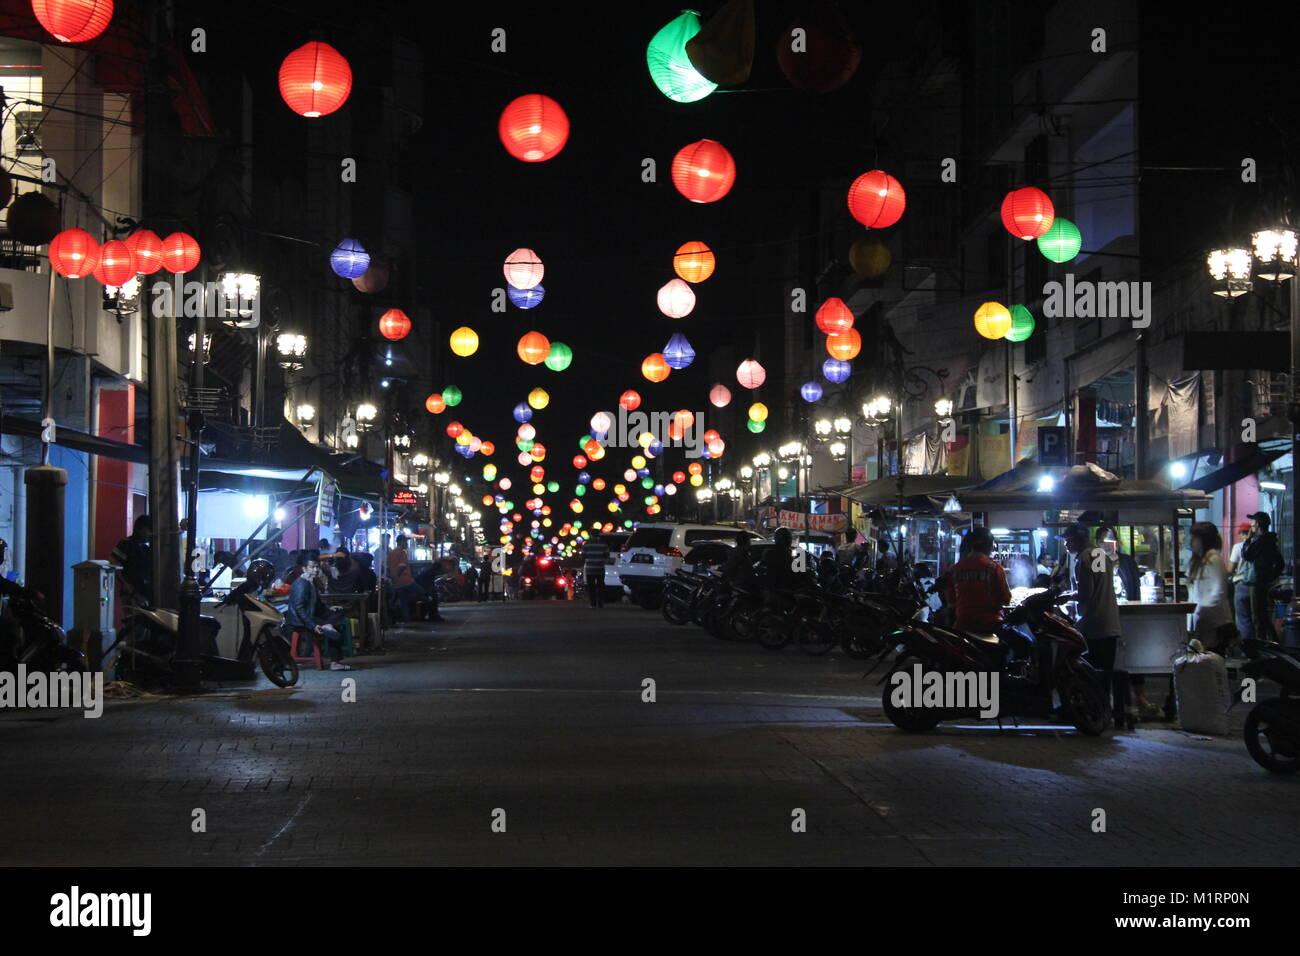 Lanterns illuminate Jalan Cibadak. Bandung, Indonesia, Southeast Asia. - Stock Image